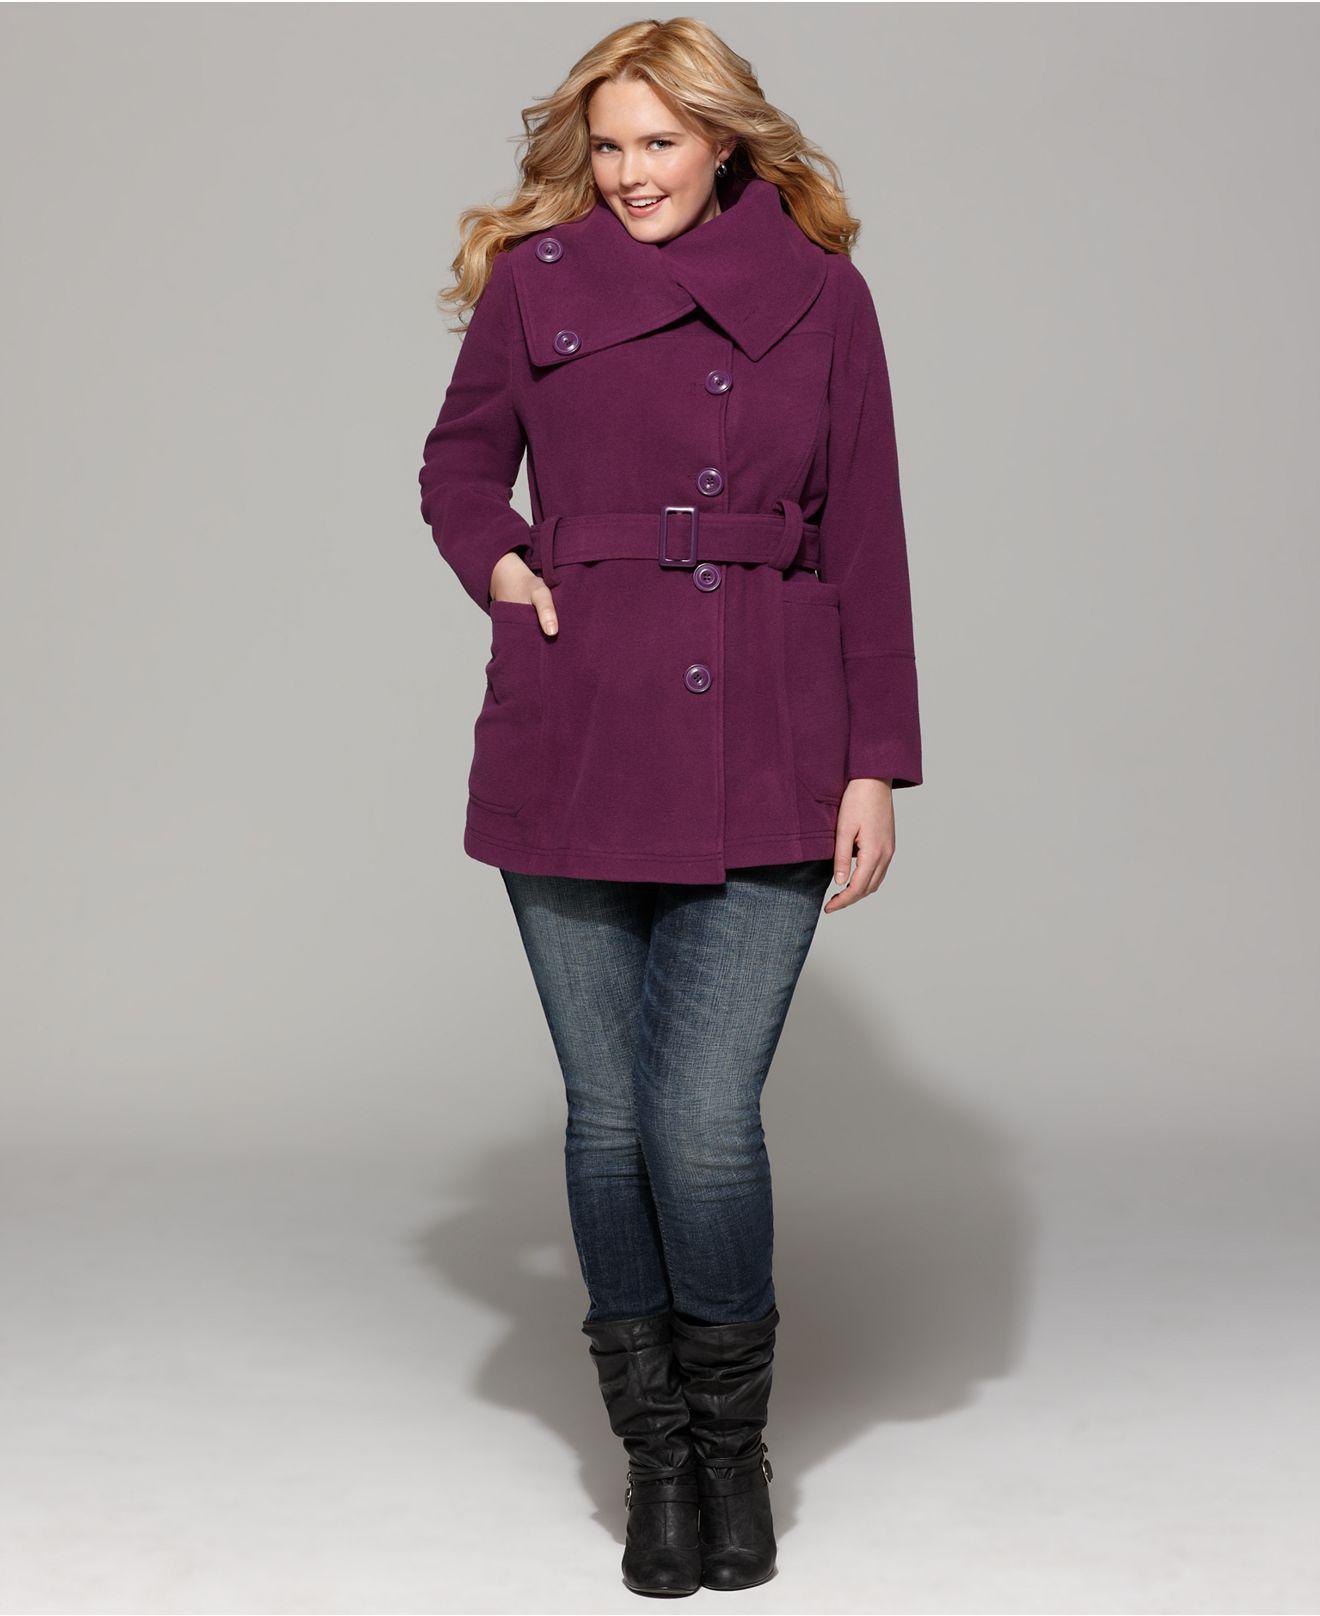 d62b0bb75ac Dollhouse plus size coat envelope neck belted coats plus sizes macys jpg  1320x1616 Dollhouse plus size